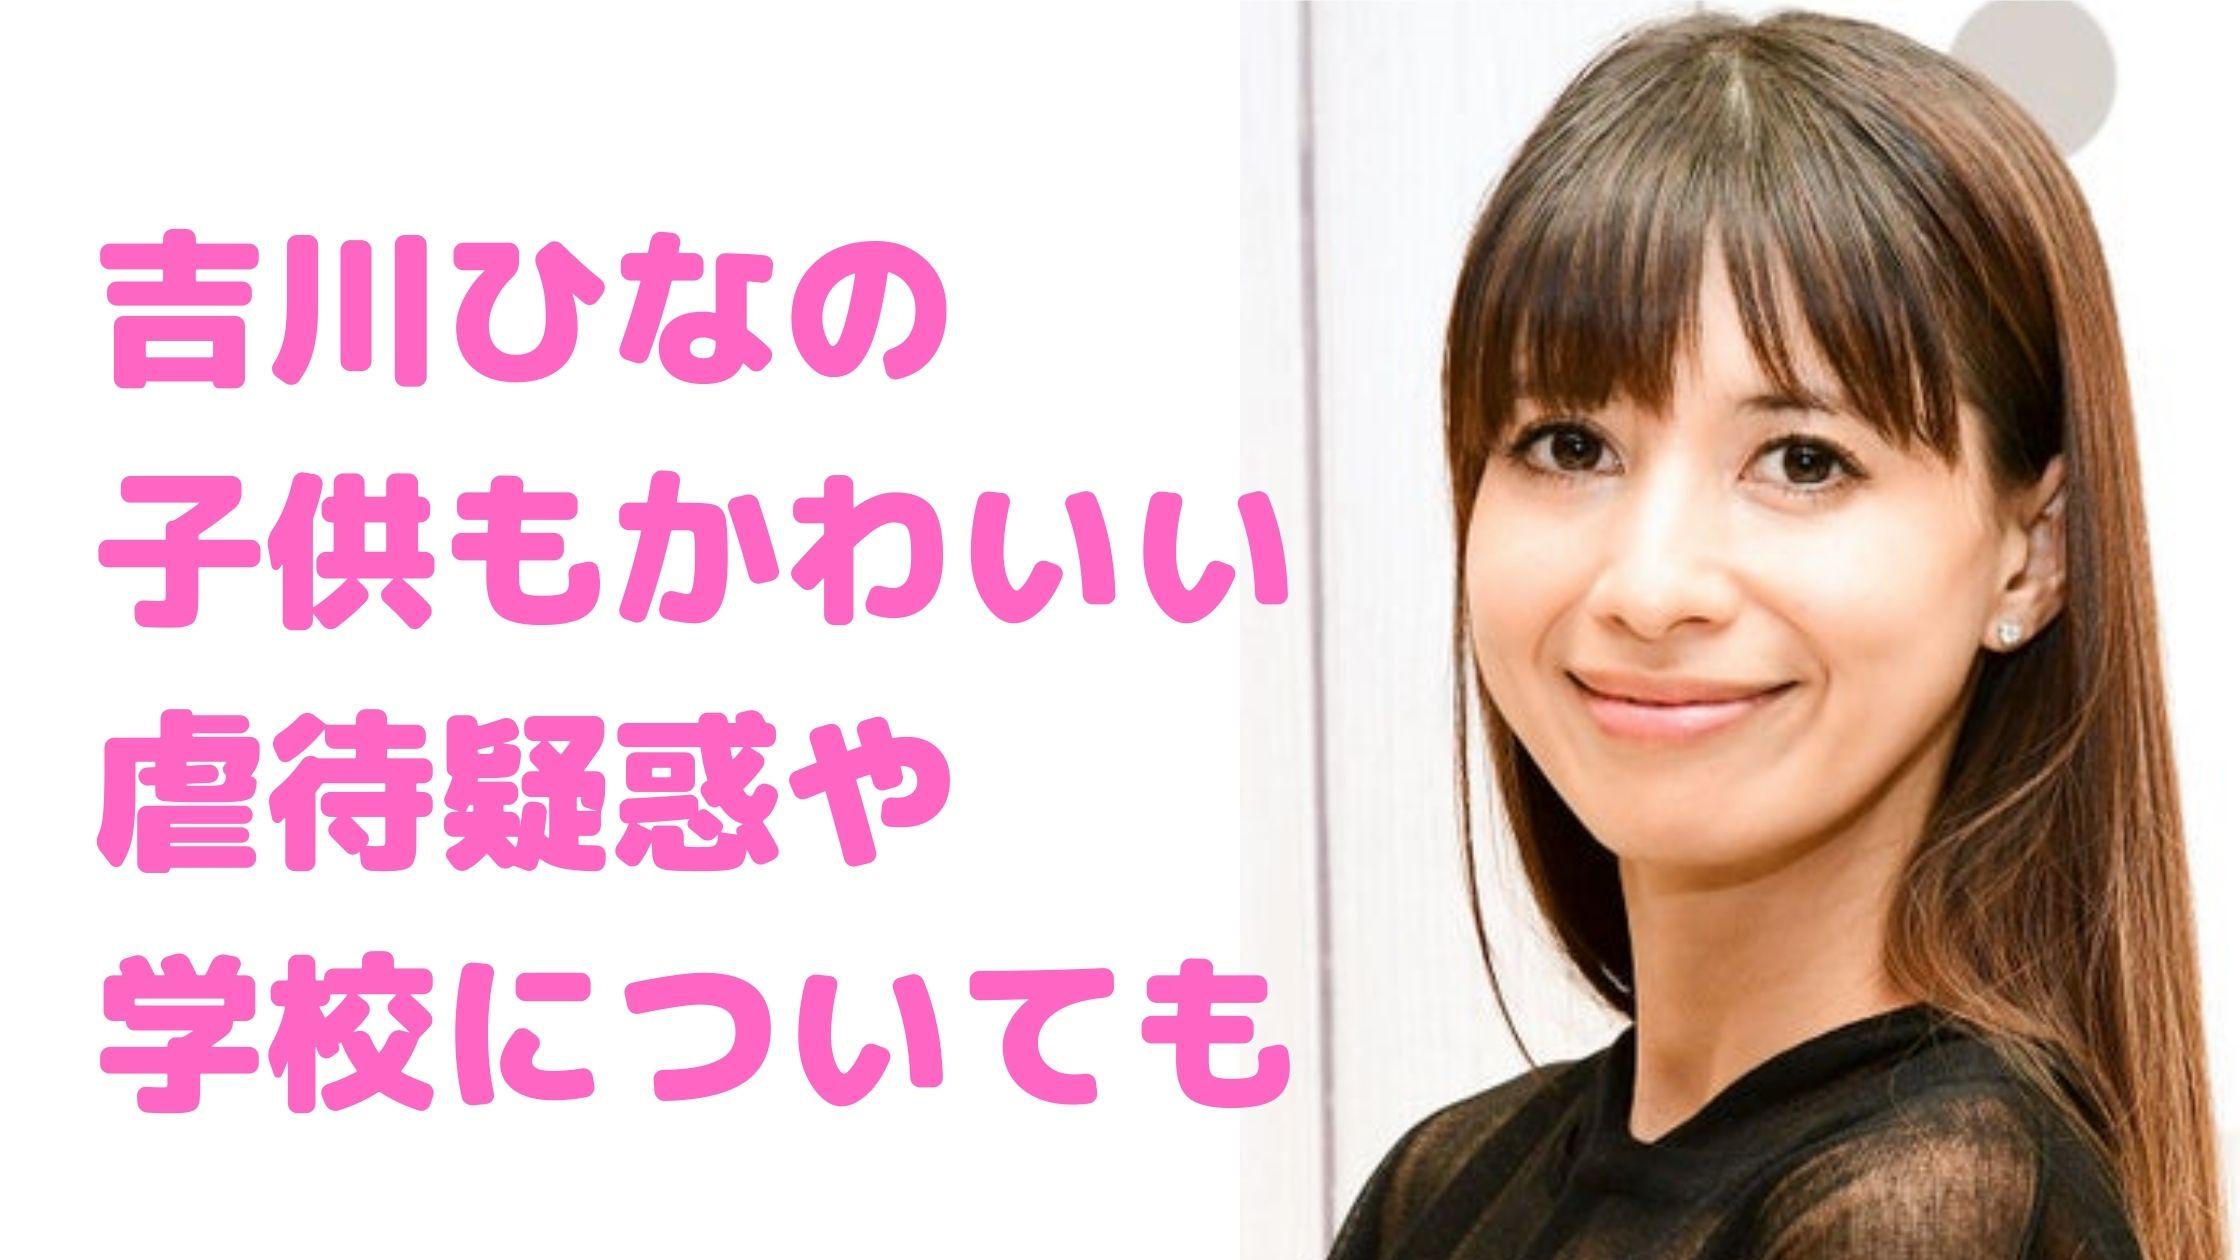 吉川ひなの 子供 性別 何人 年齢 名前 虐待 出産予定日 学校